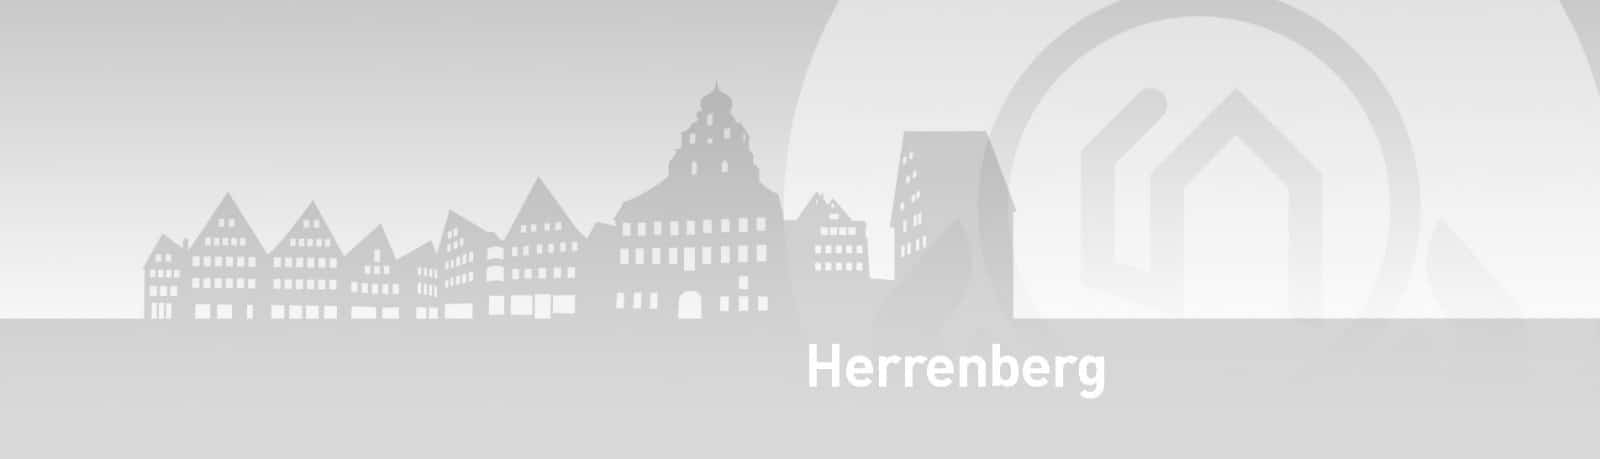 Herrenberg SENCURINA 1904x546 - Besondere Leistungen Herrenberg